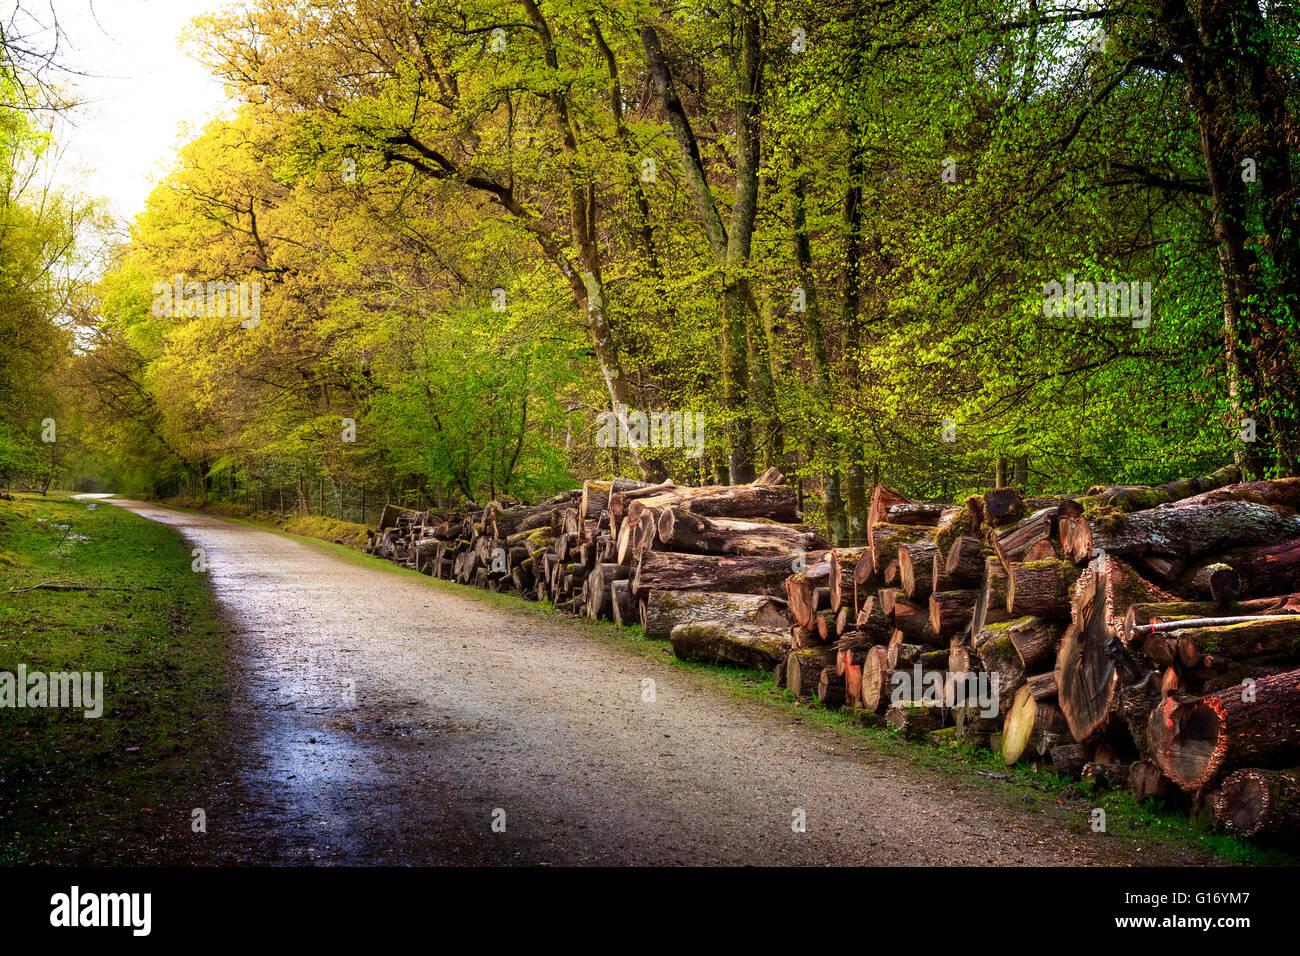 Pondhead Inclosure, Beechen Lane, New Forest, Lyndhurst, Hampshire, England - Stock Image